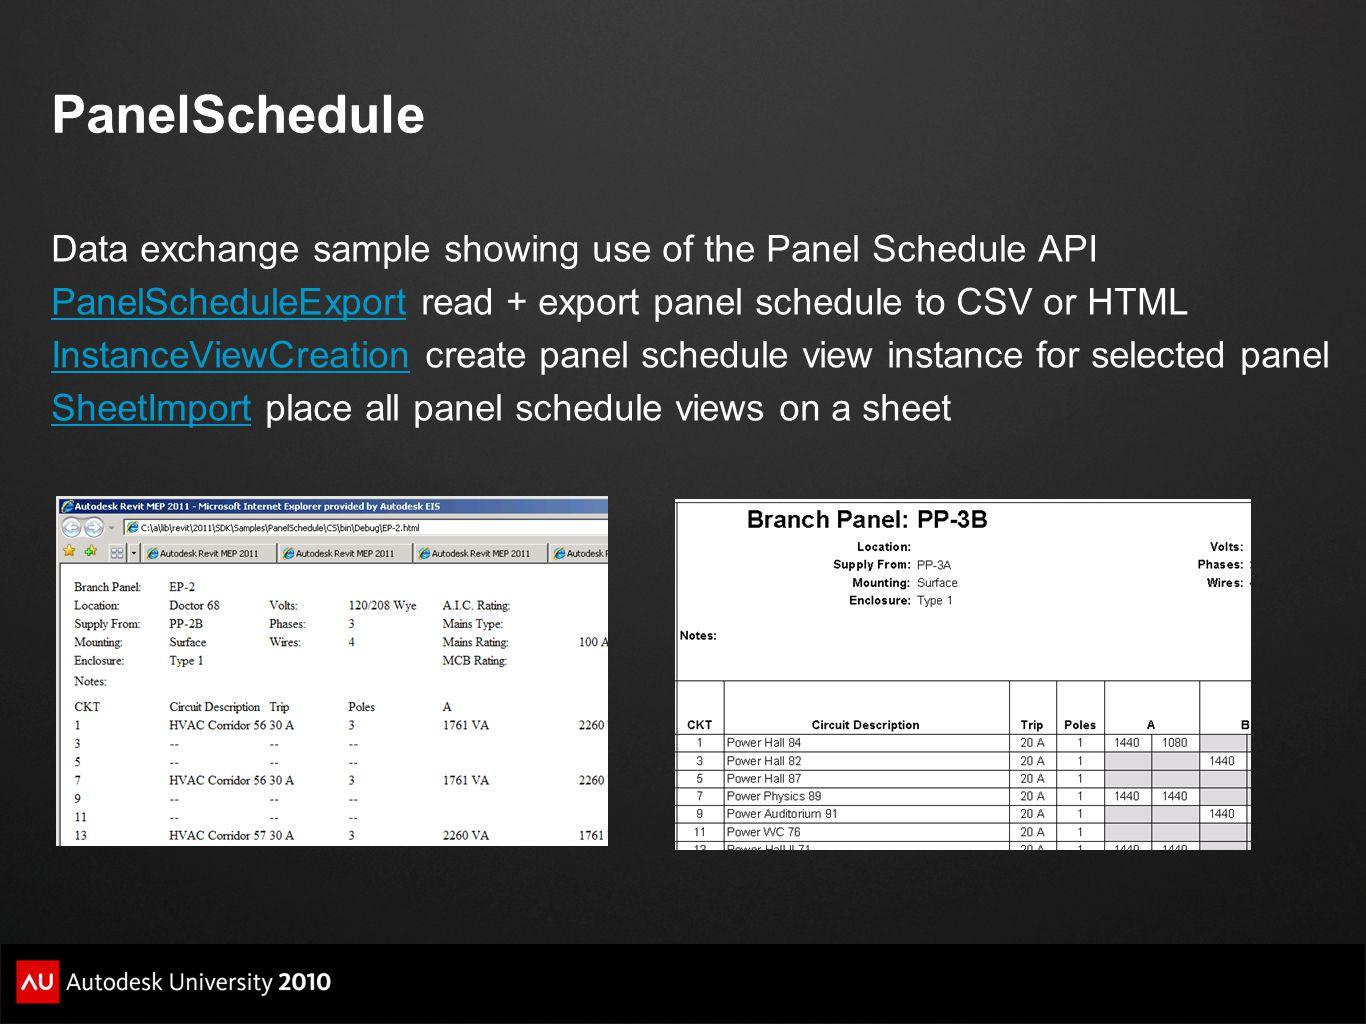 PanelSchedule